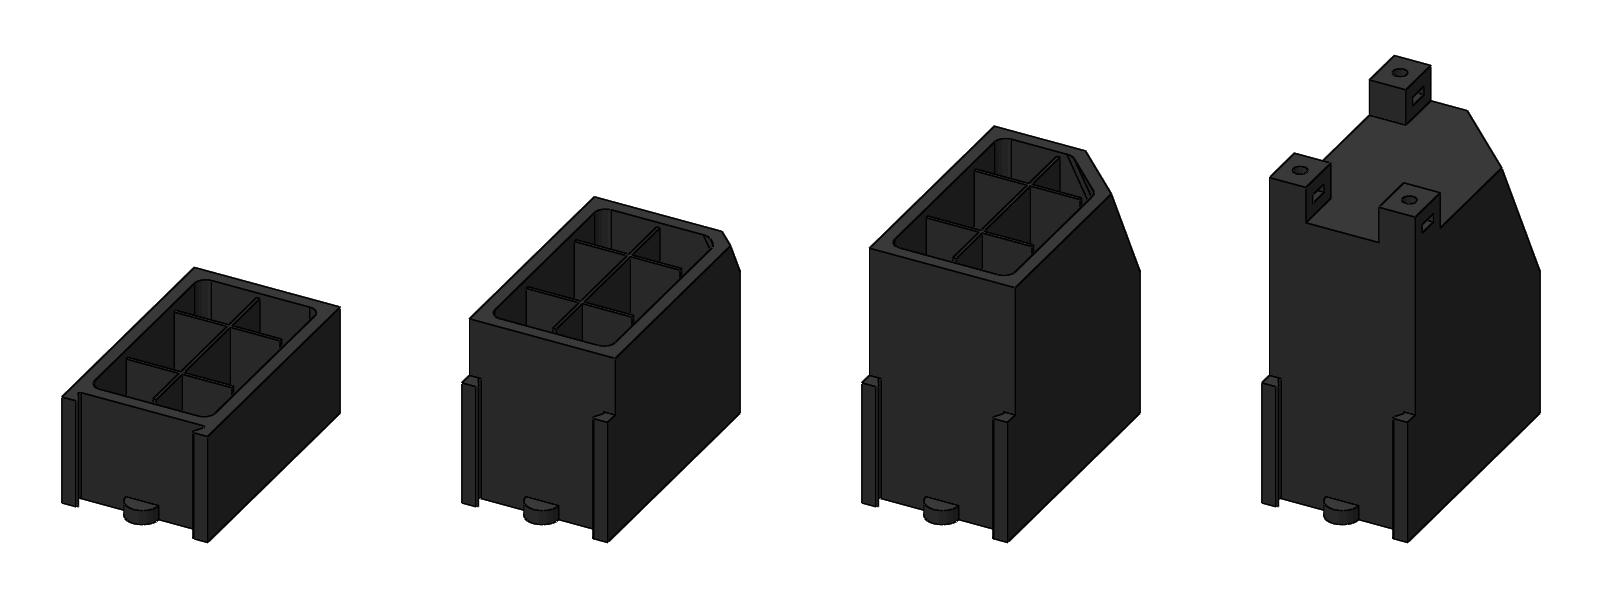 Second prototype internals